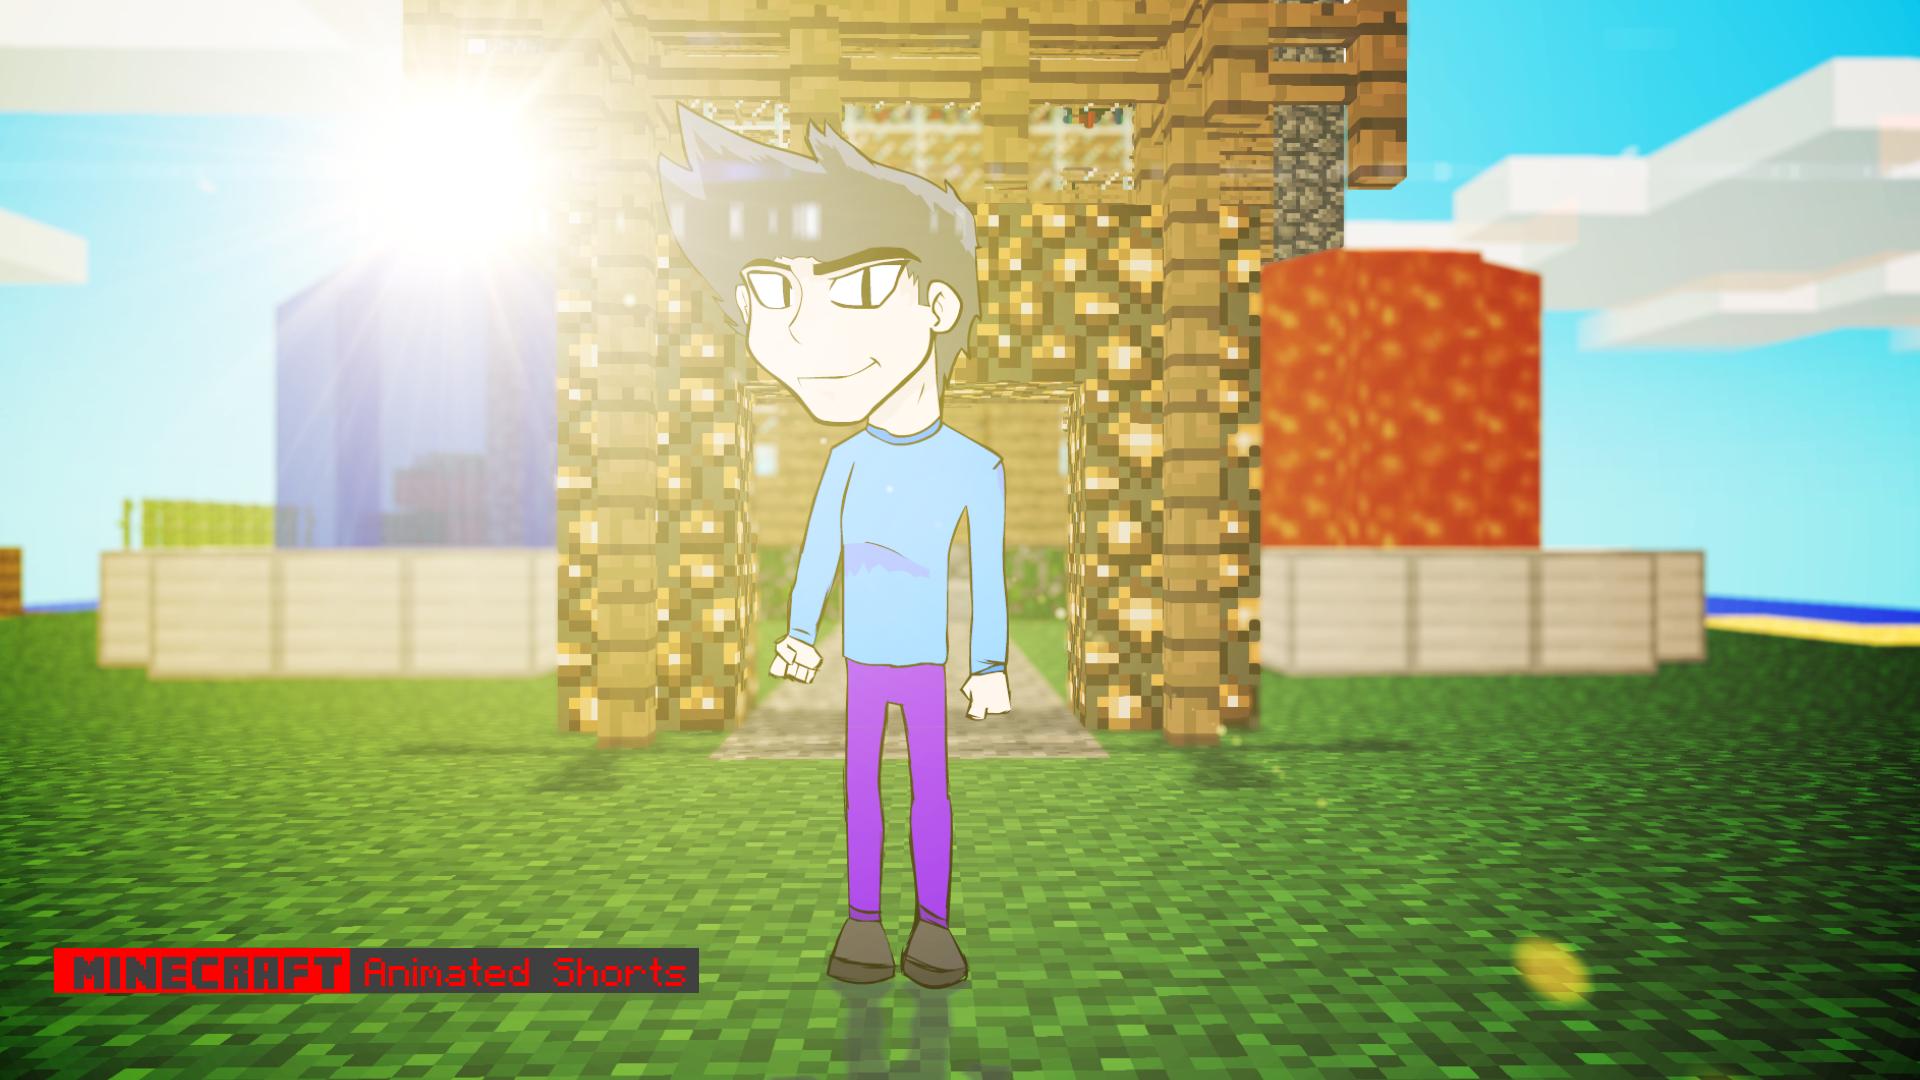 Steve of MineCraftia